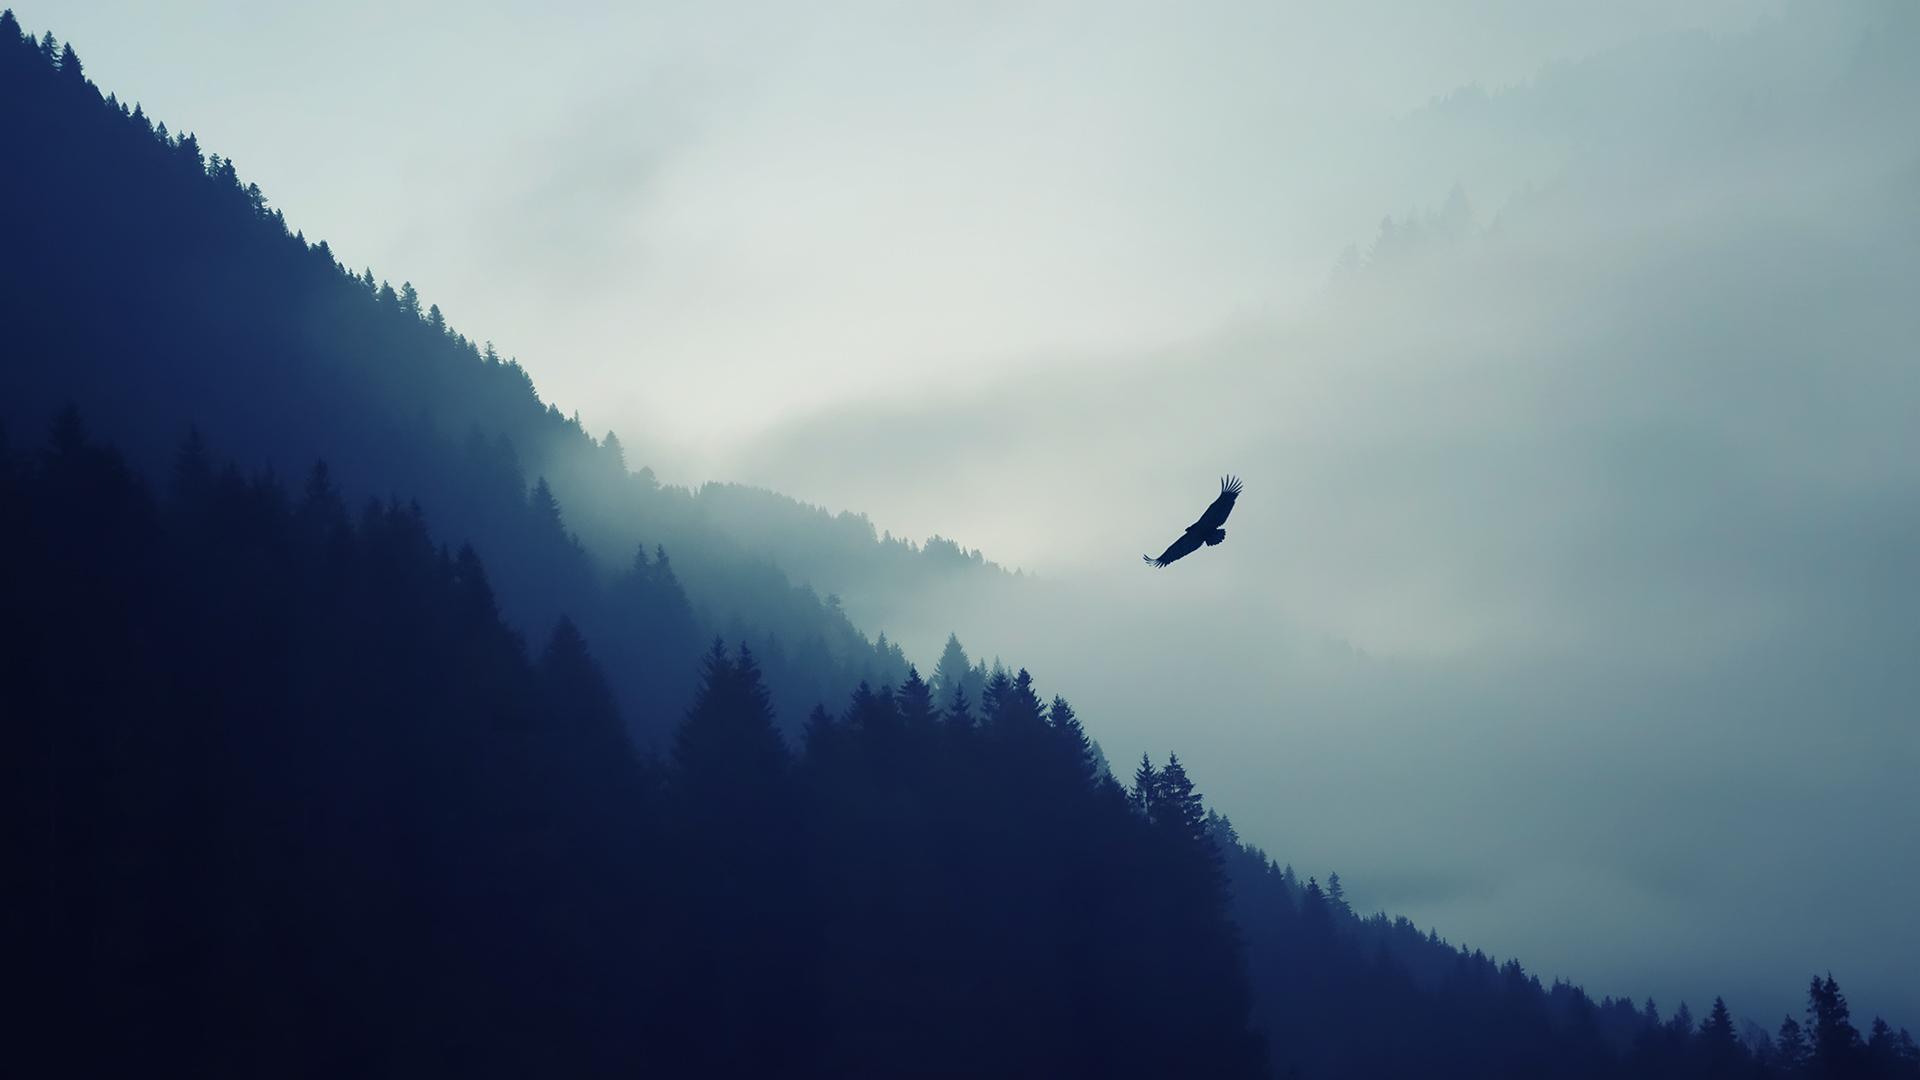 General 1920x1080 nature mist forest birds blue hill calm simple animals